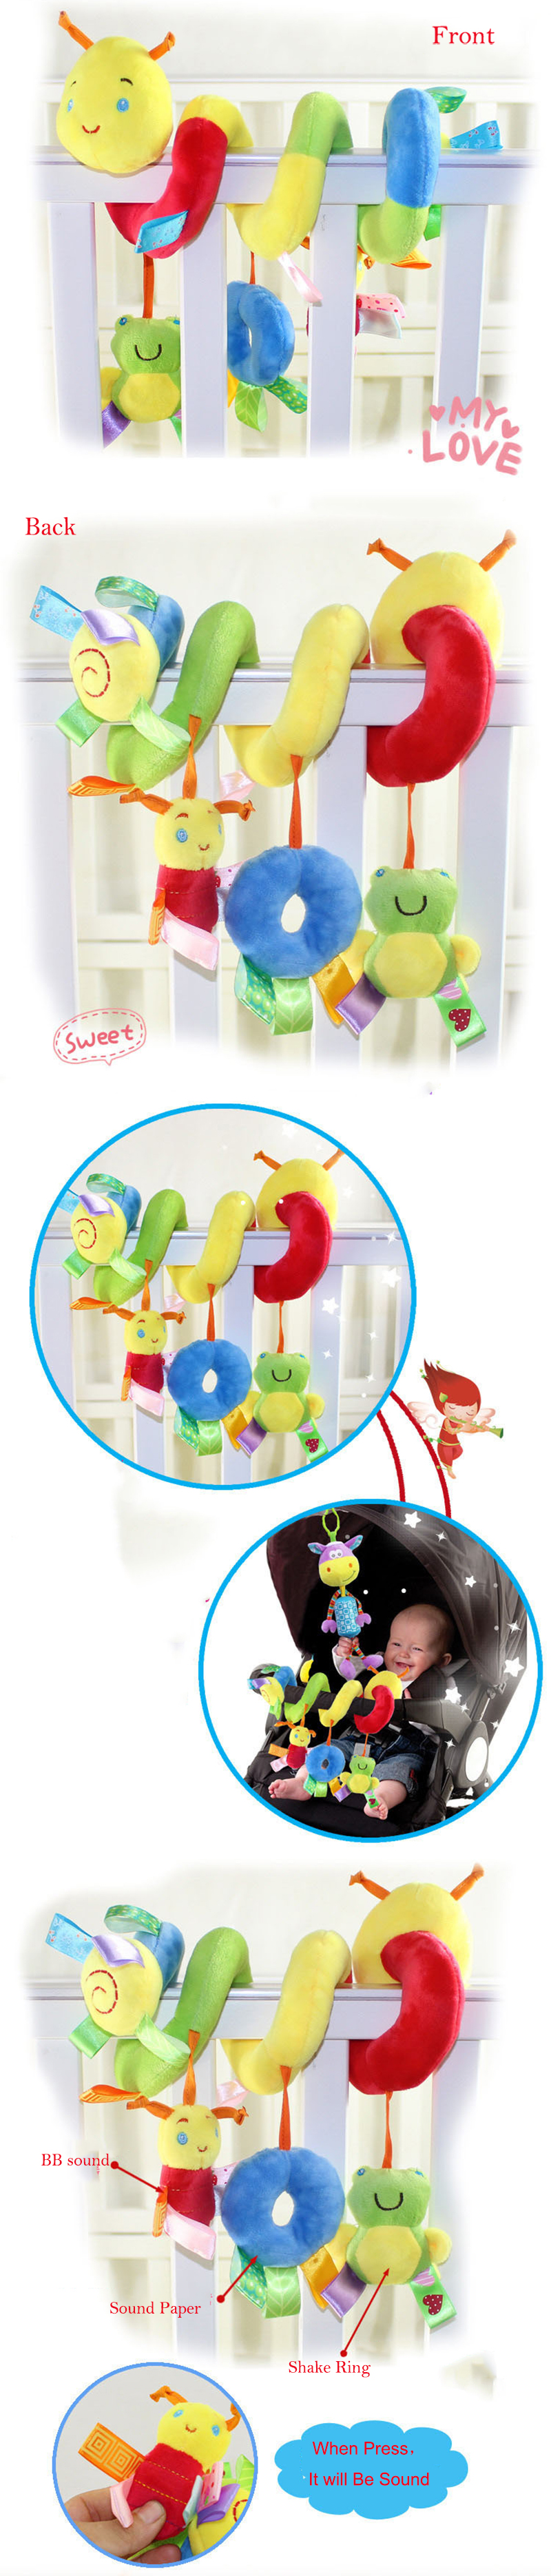 Spiral Stroller toy rattle baby toy 3 1